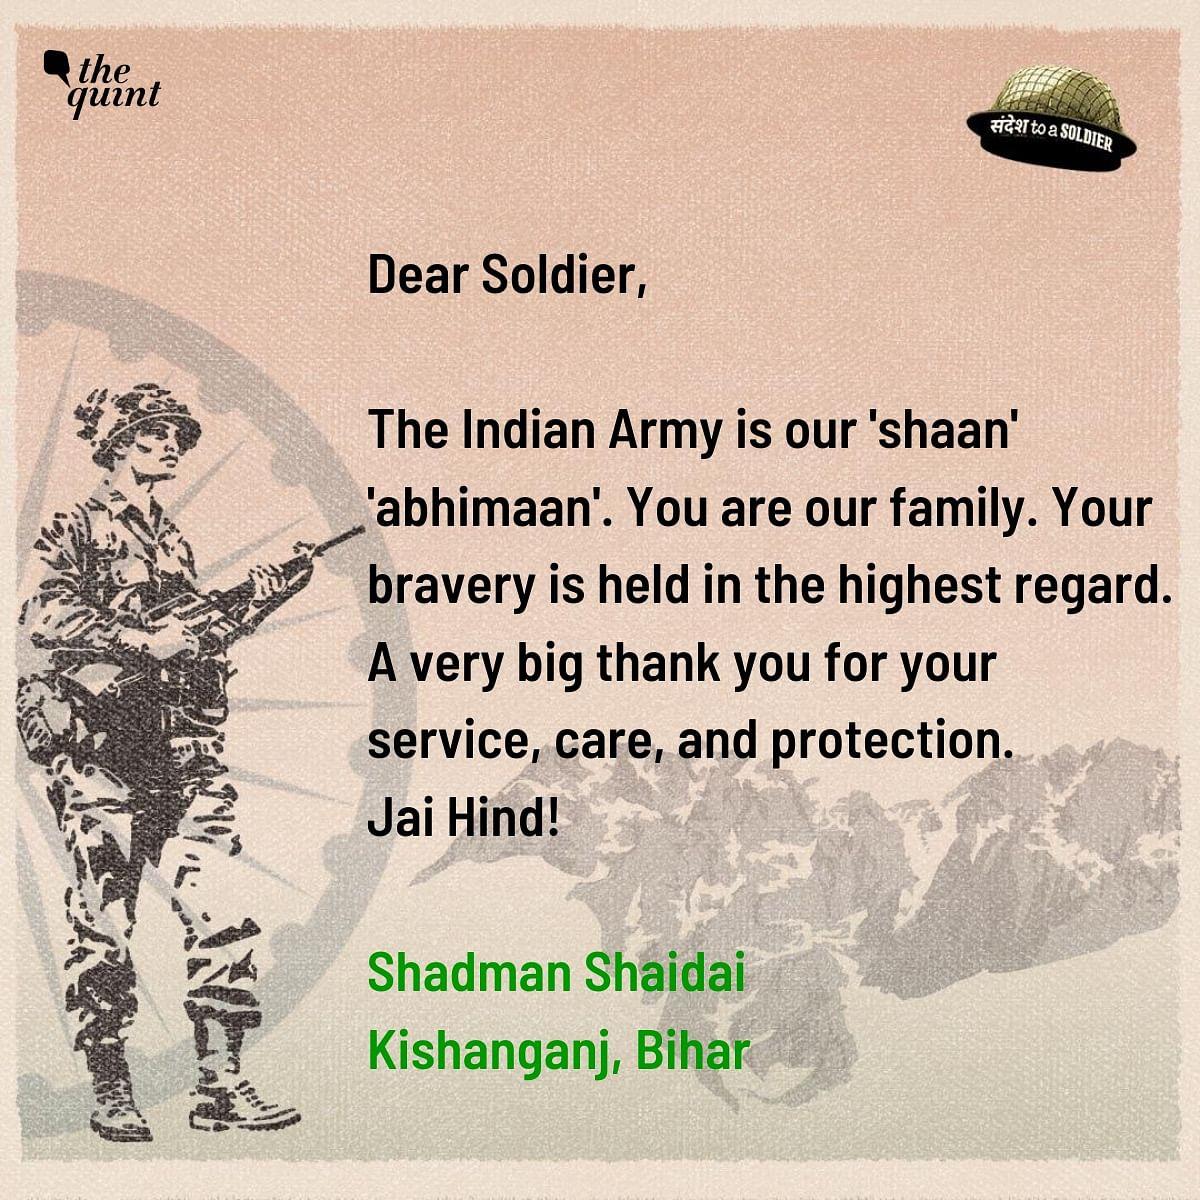 Shadman Shaidai from Bihar sends his sandesh to a soldier.